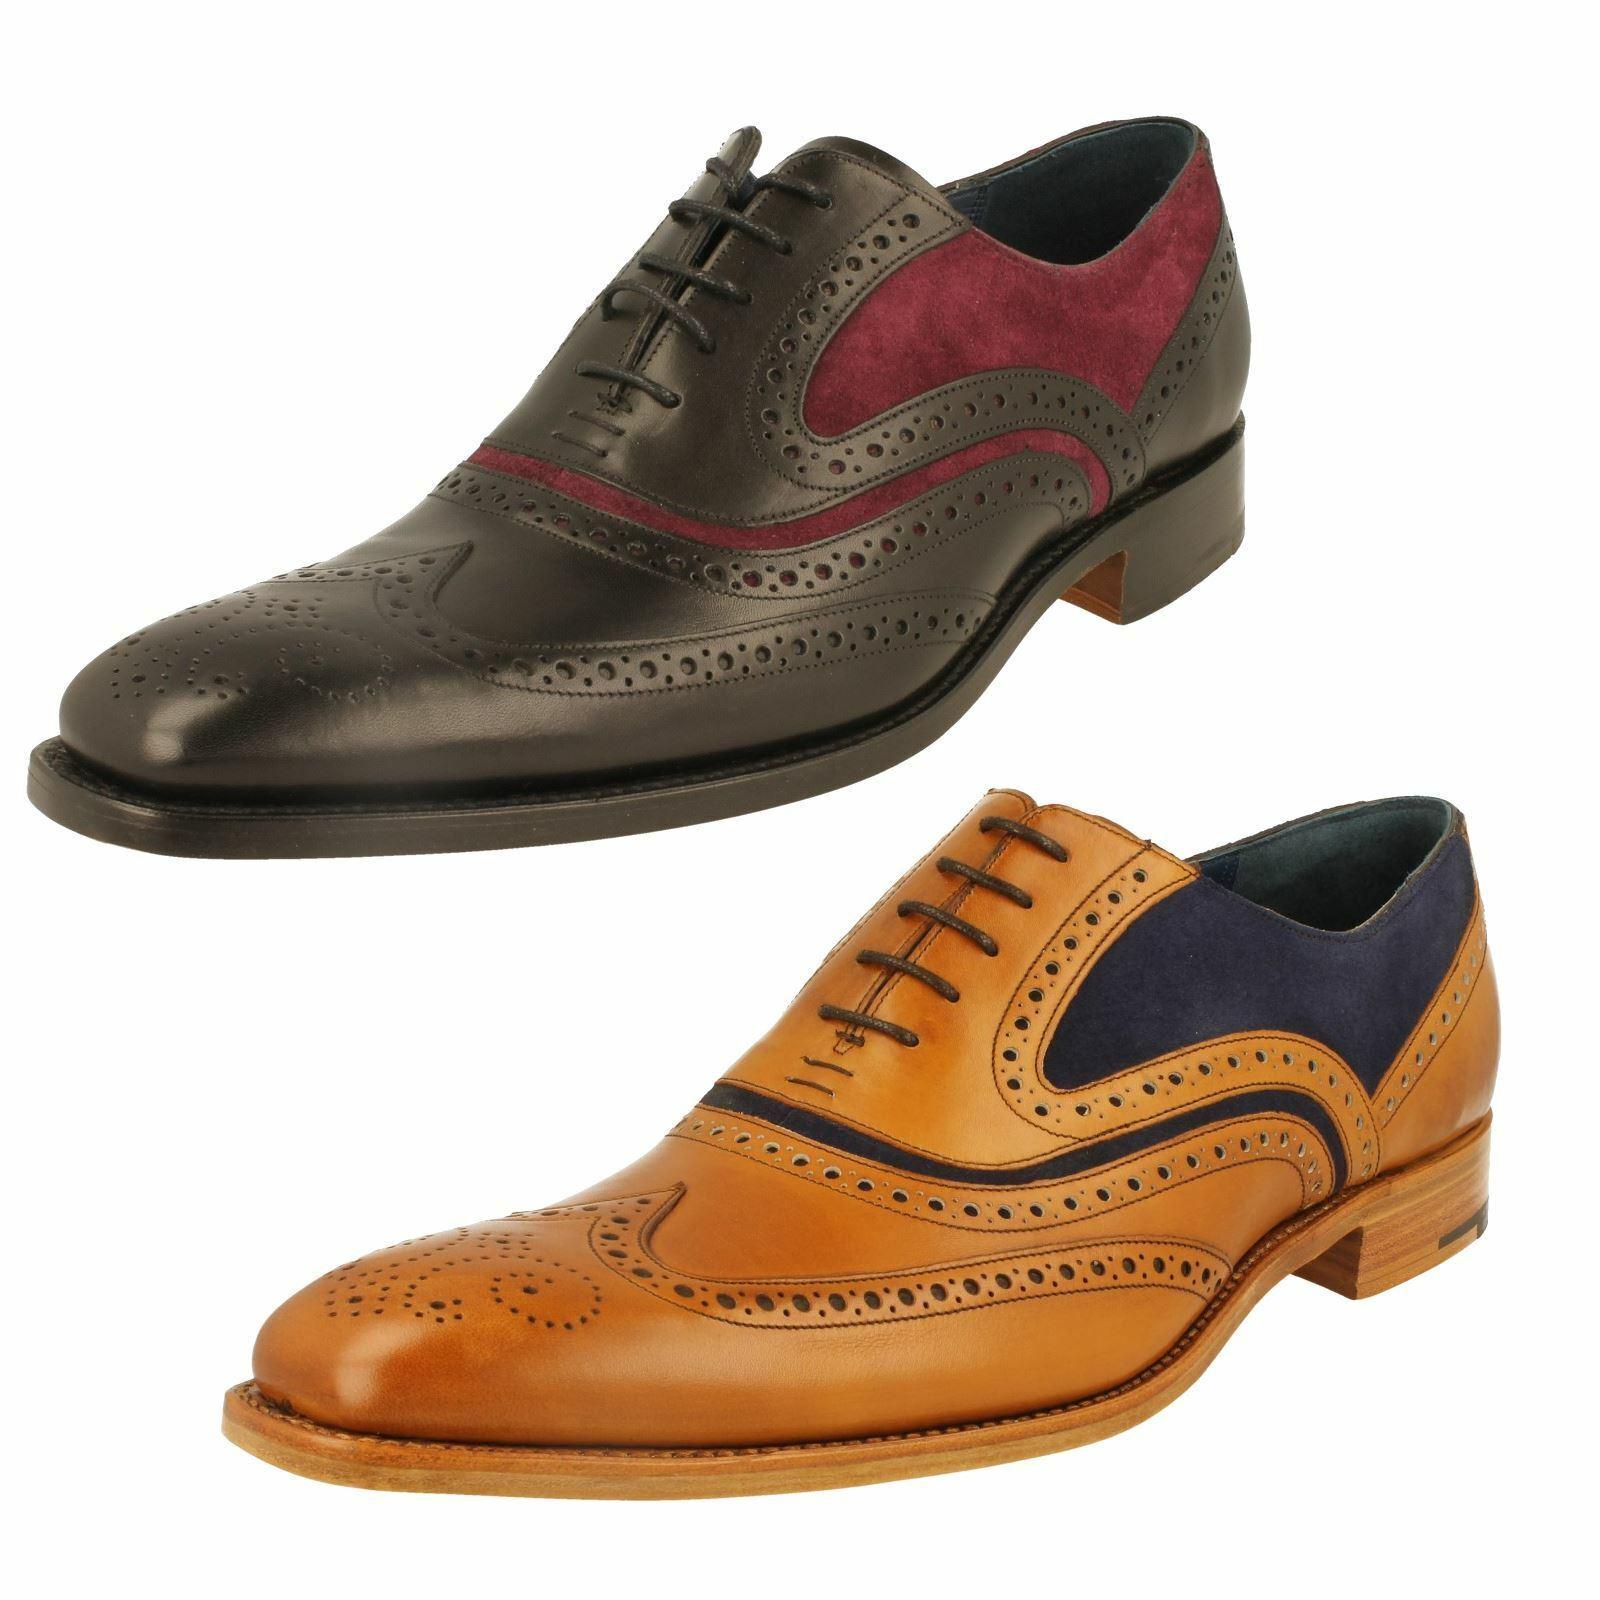 Barker Mens Formal Brogue shoes McClean